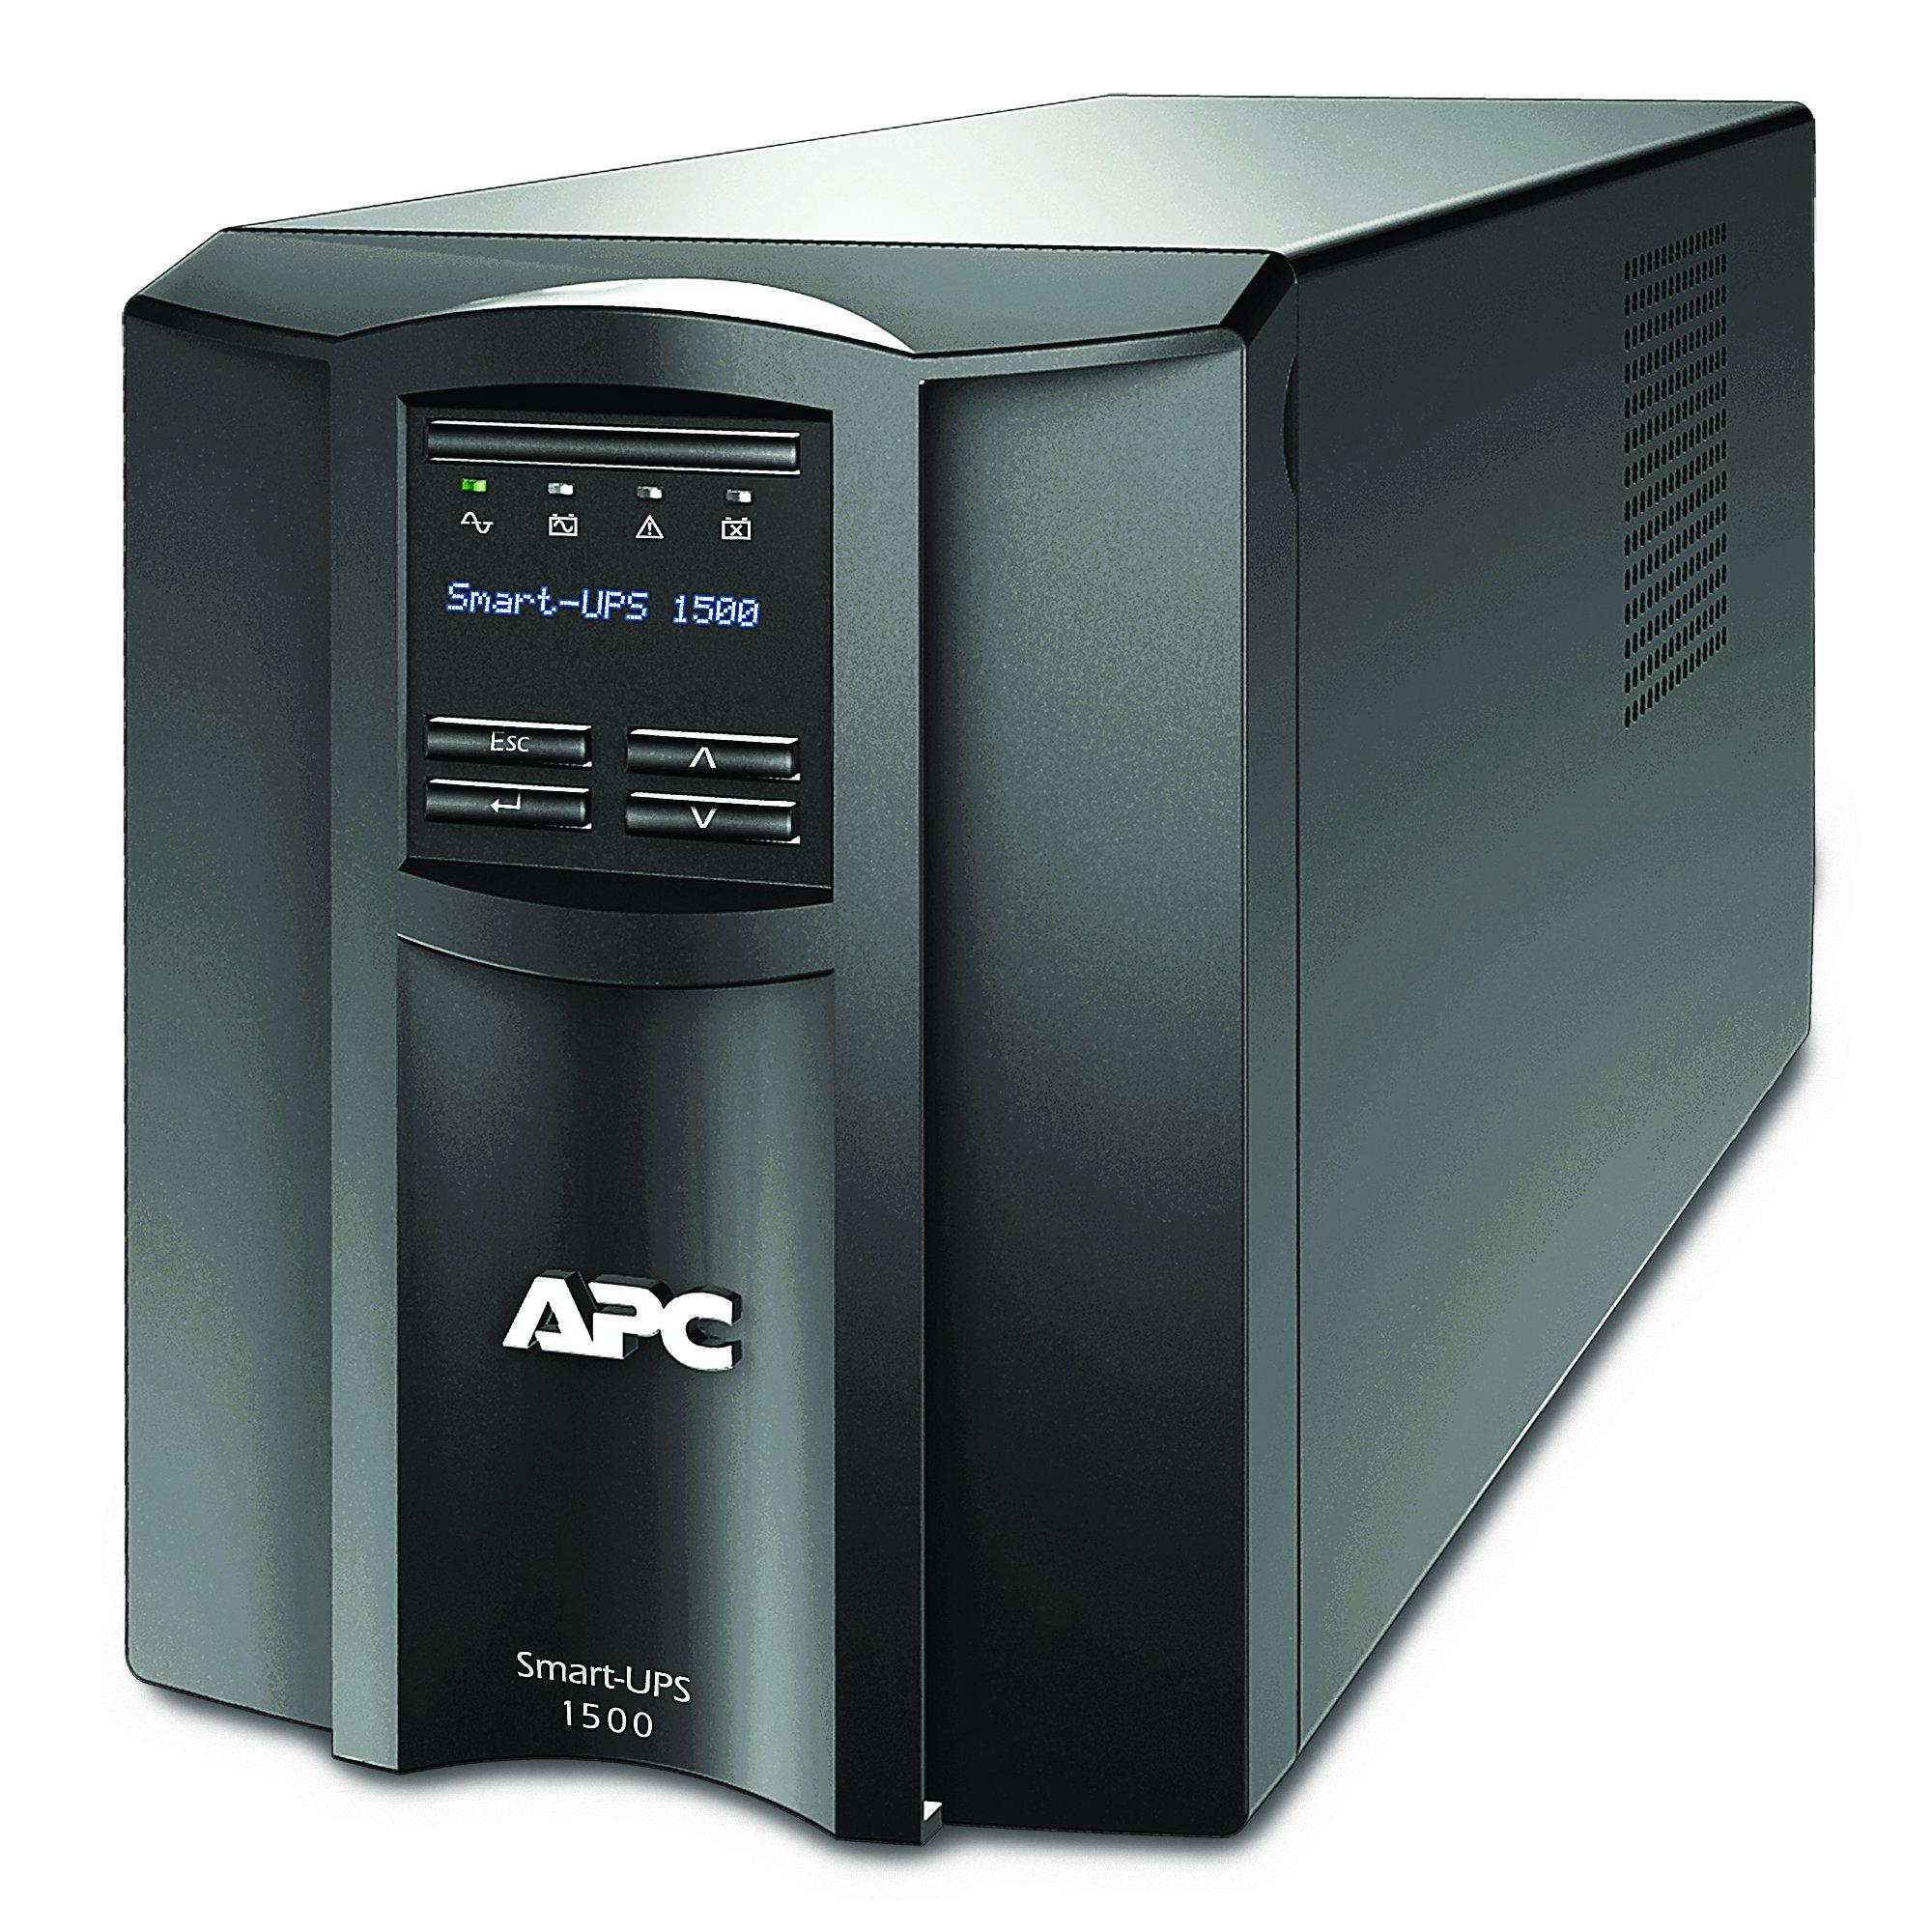 APC 1500VA Smart-UPS with SmartConnect, Pure Sinewave UPS Battery Backup, Line Interactive, 120V Uninterruptible Power Supply (SMT1500C) by APC